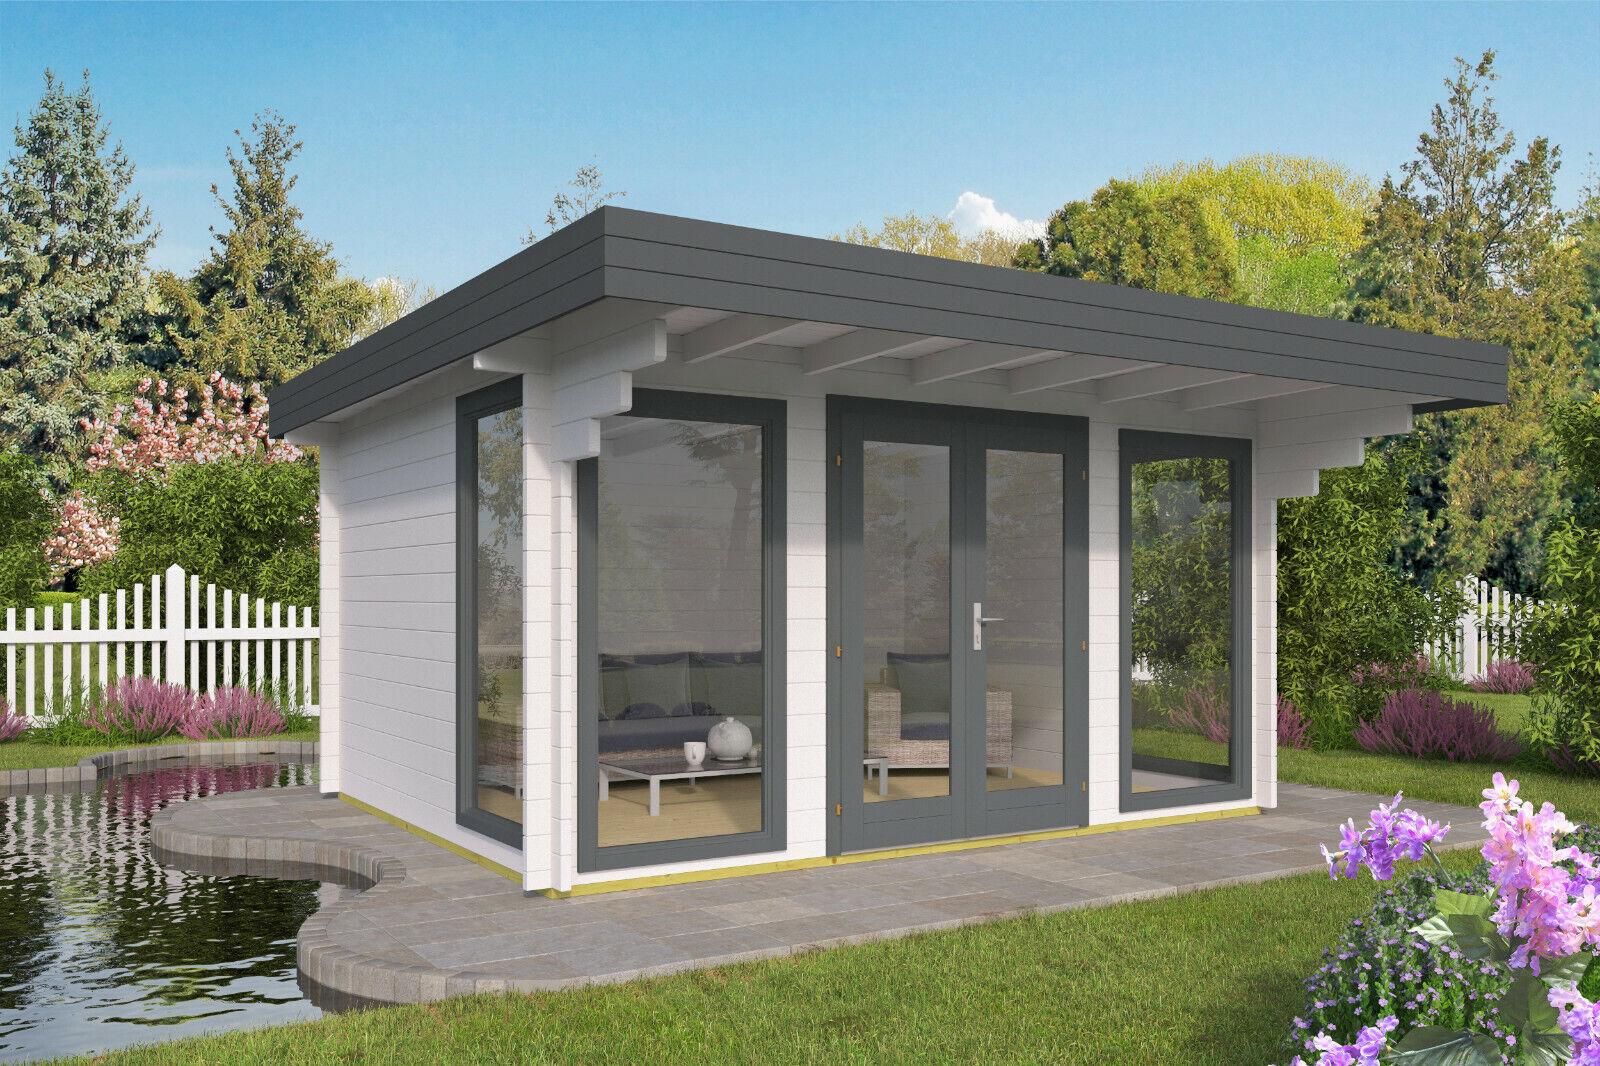 44mm Gartenhaus ISO-Glas 435x350cm Blockhütte Schuppen Gerätehaus Holzhaus Holz